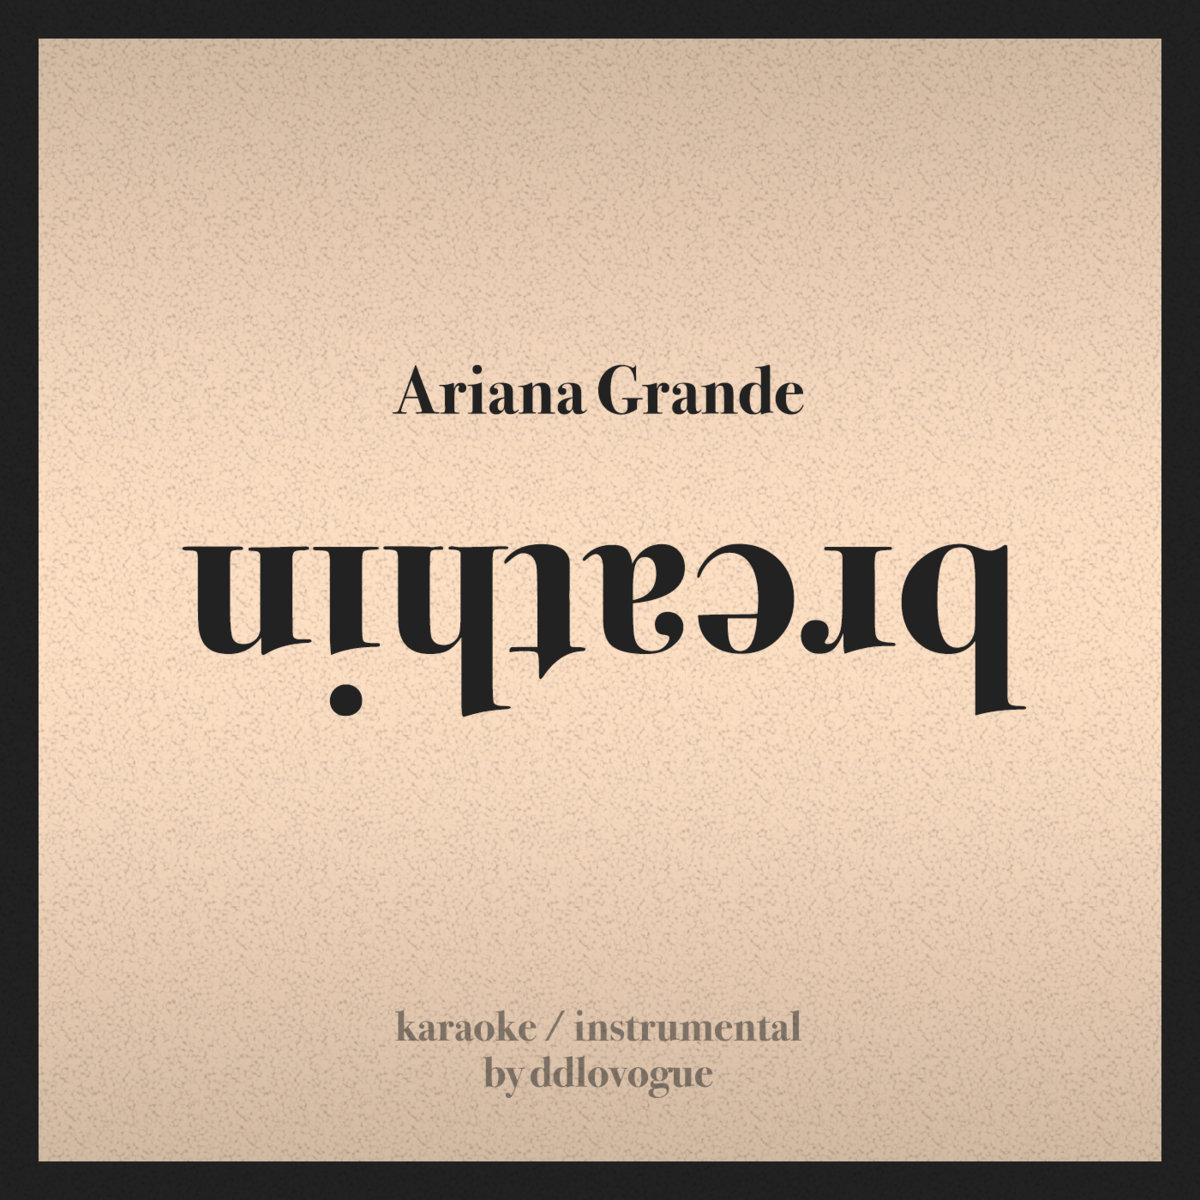 Ariana Grande - breathin (Karaoke / Instrumental by ddlovogue